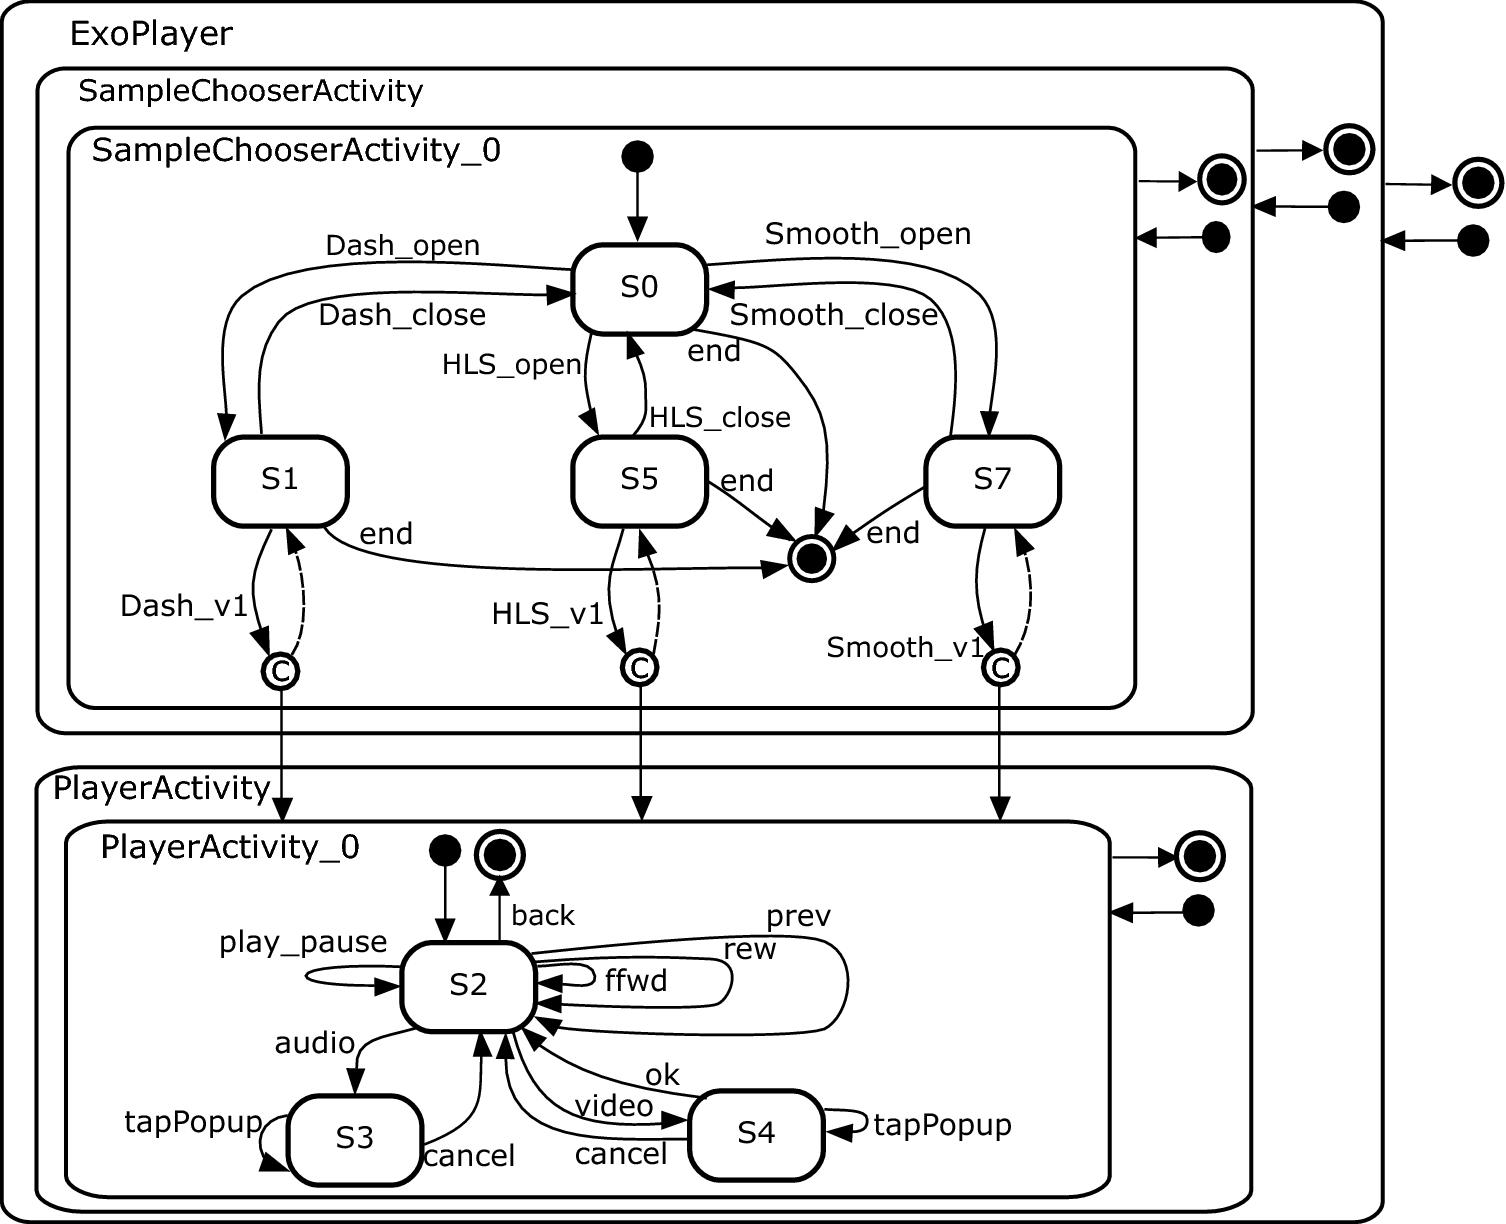 Model-based testing of apps in real network scenarios | SpringerLink